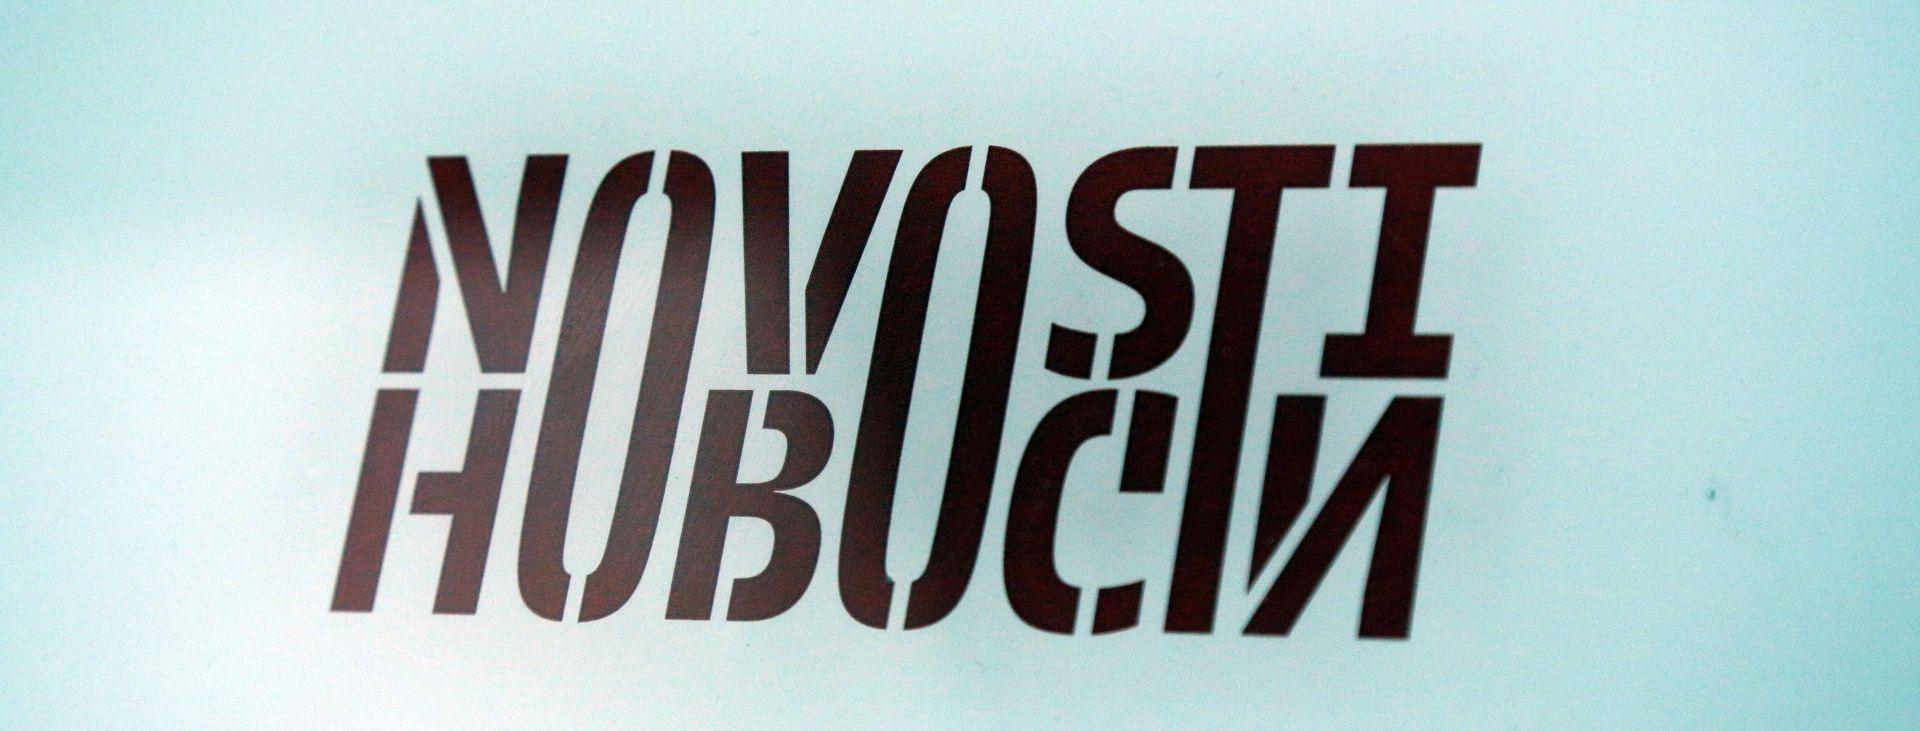 Božidar Alić izgubio spor protiv izdavača Novosti